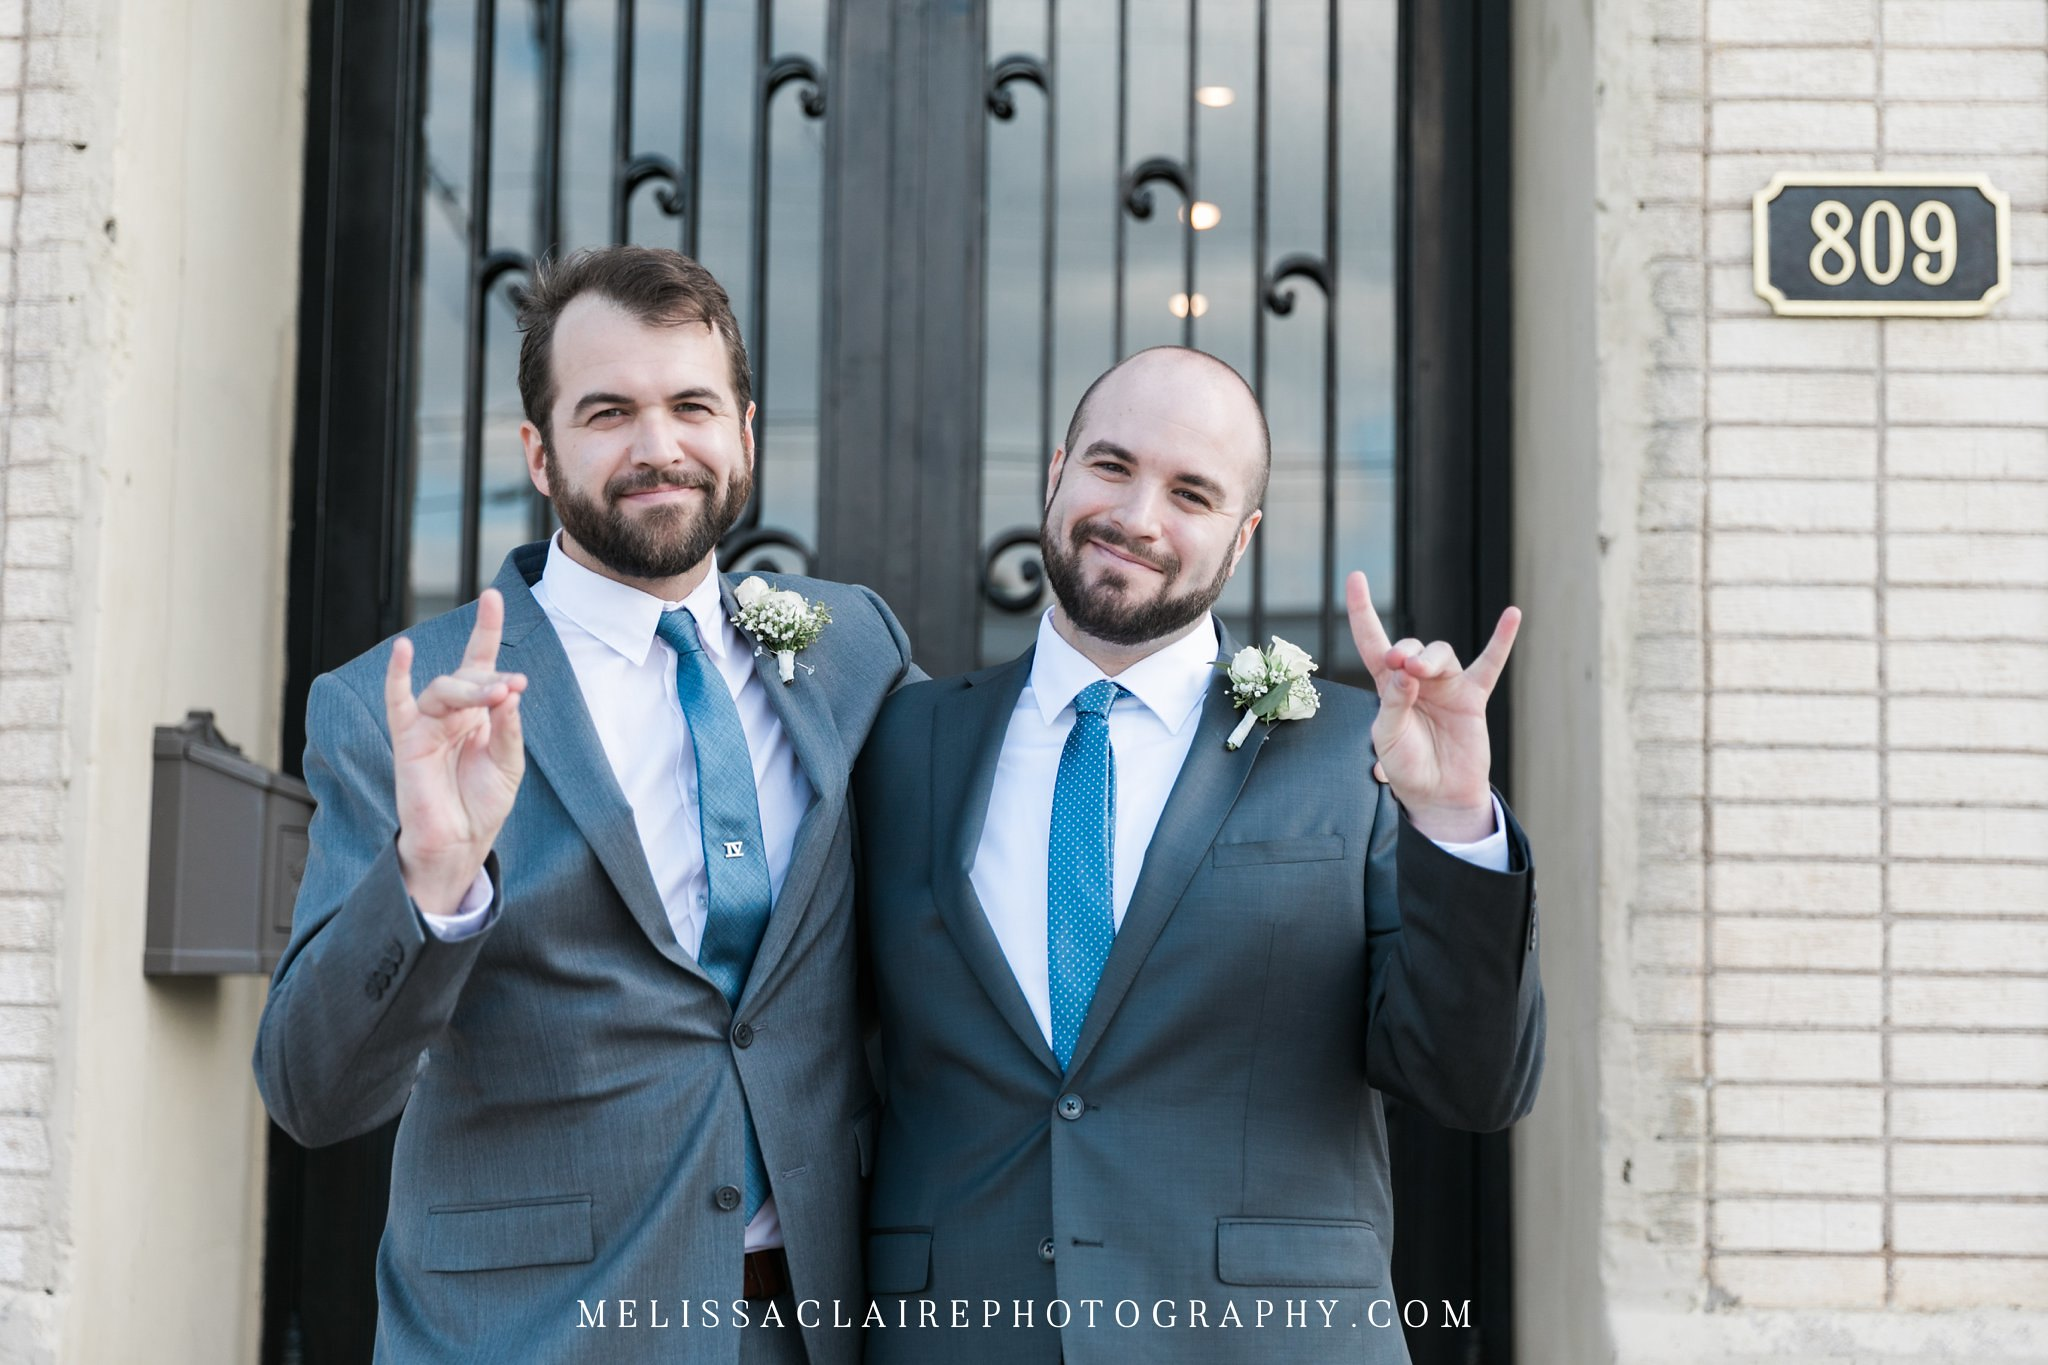 809_at_vickery_wedding_0007